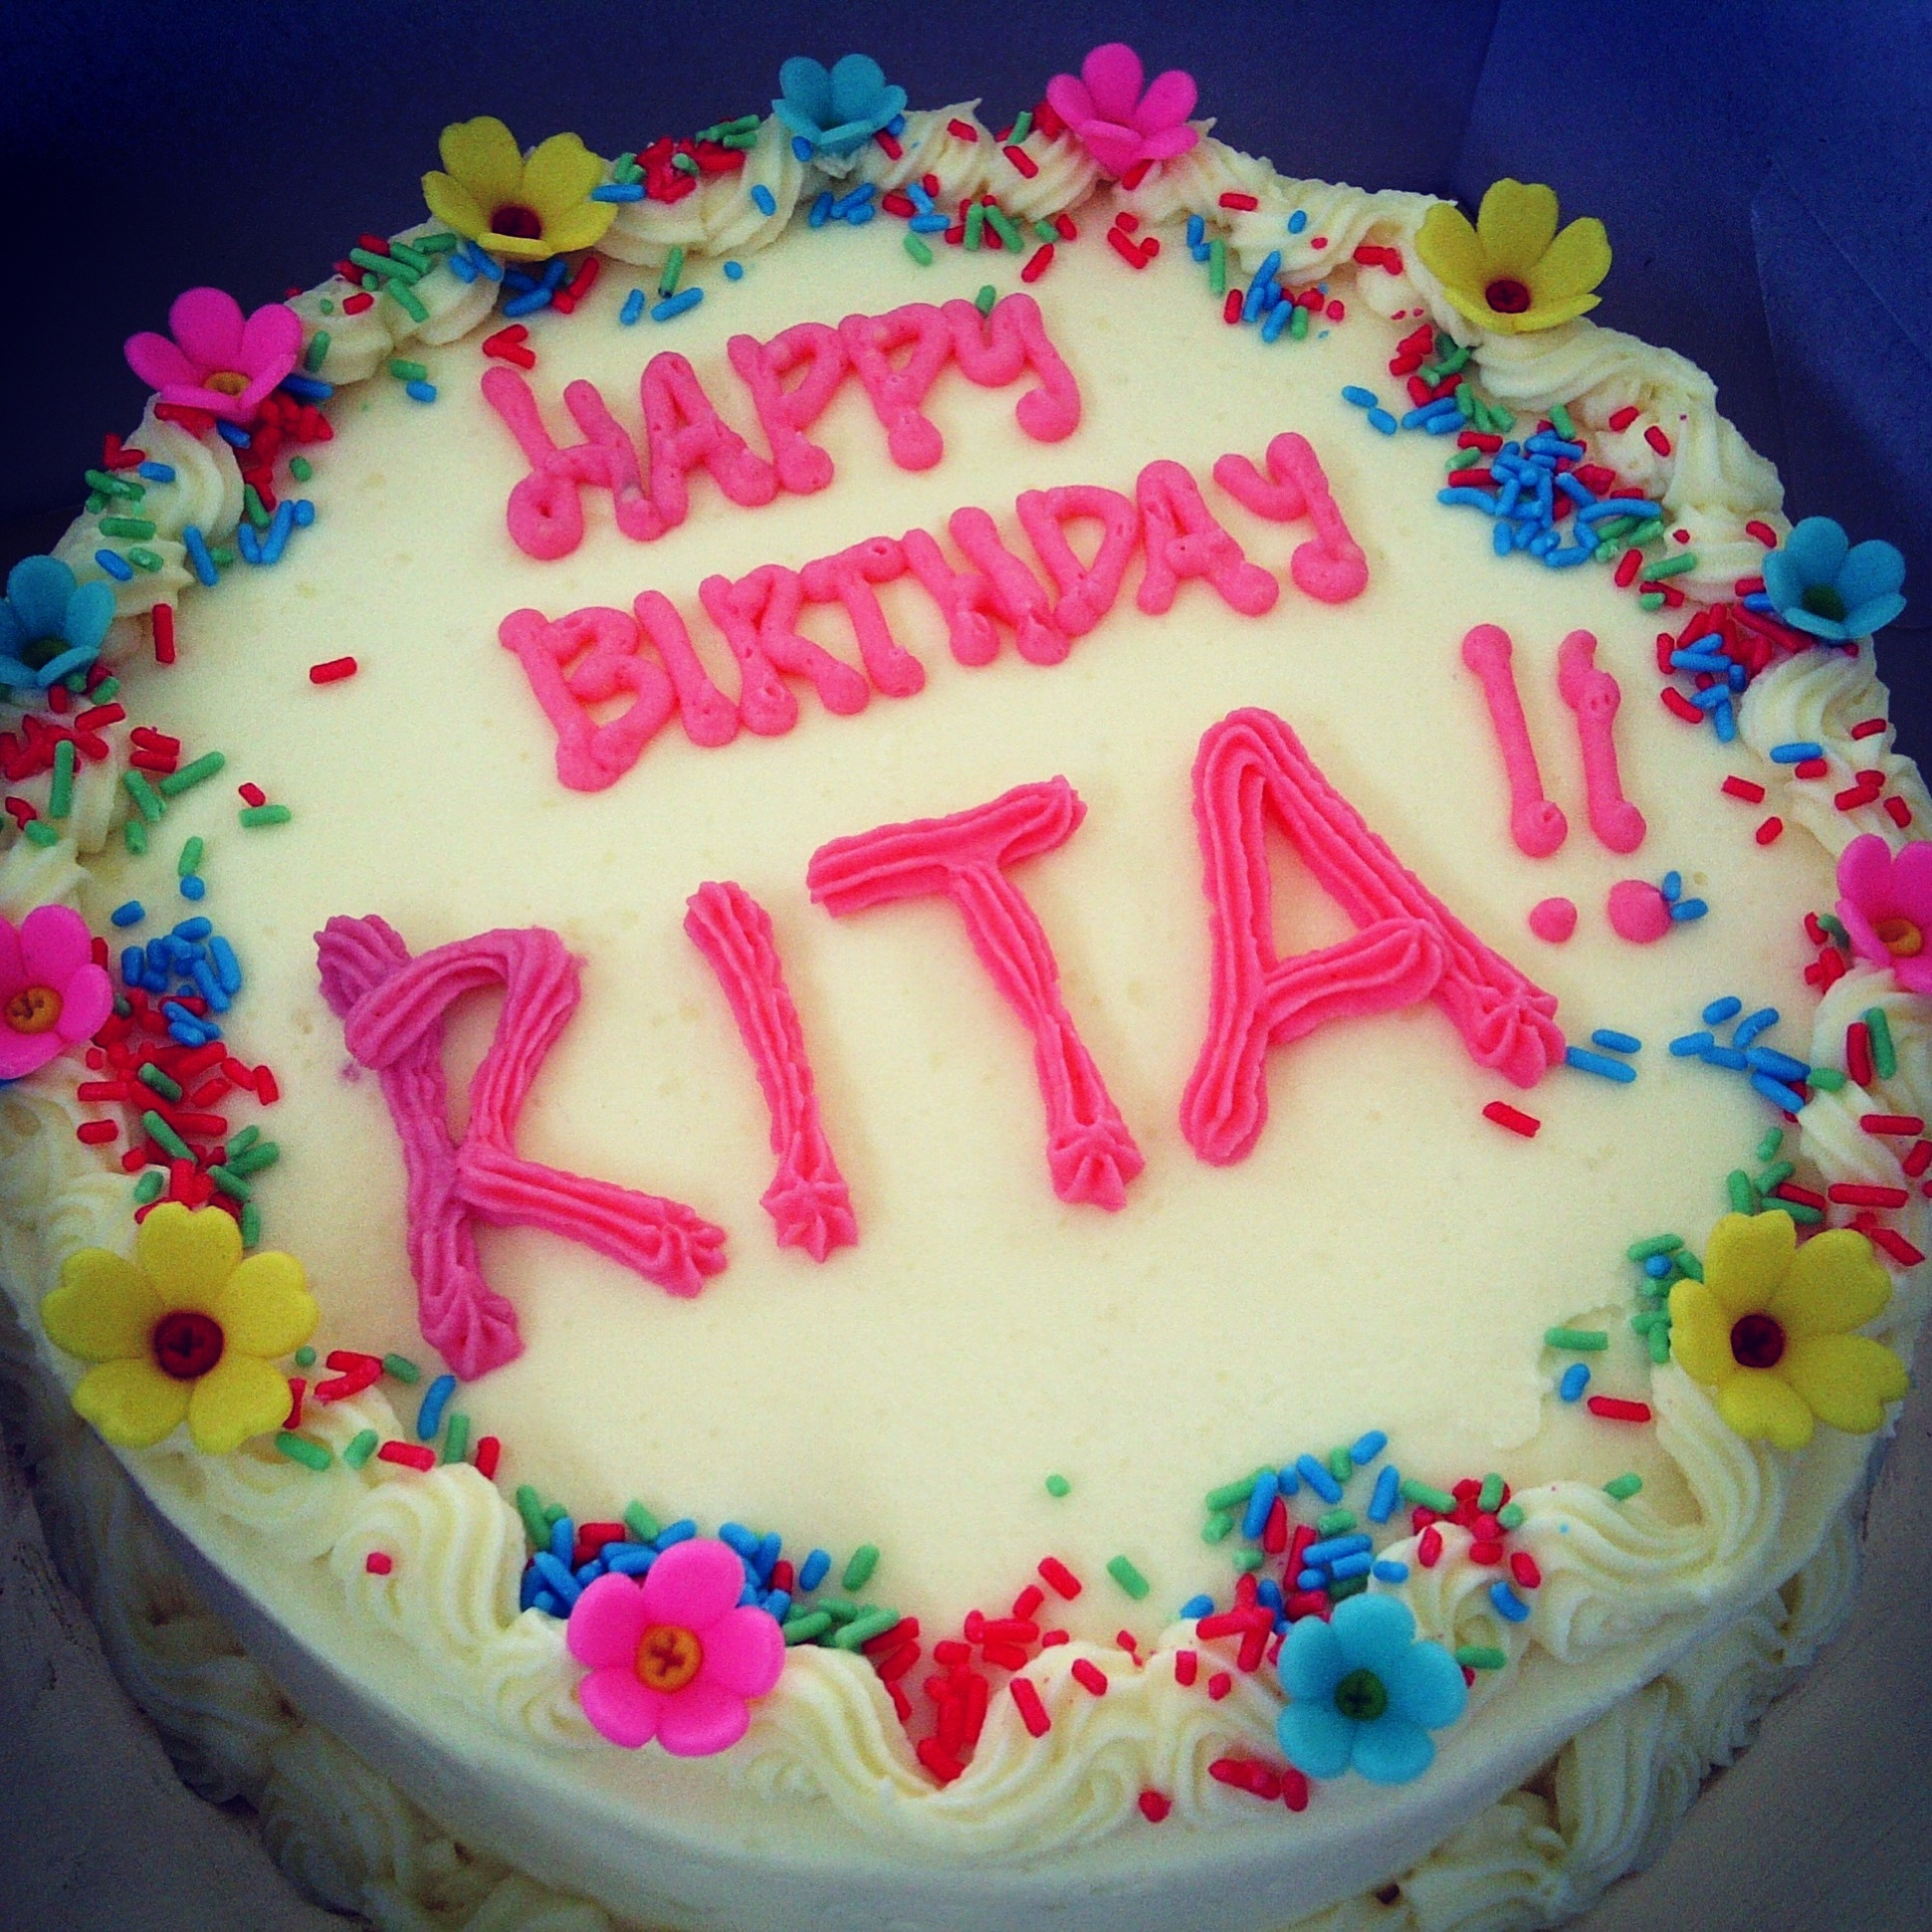 Happy Birthday Cake With Name Rita